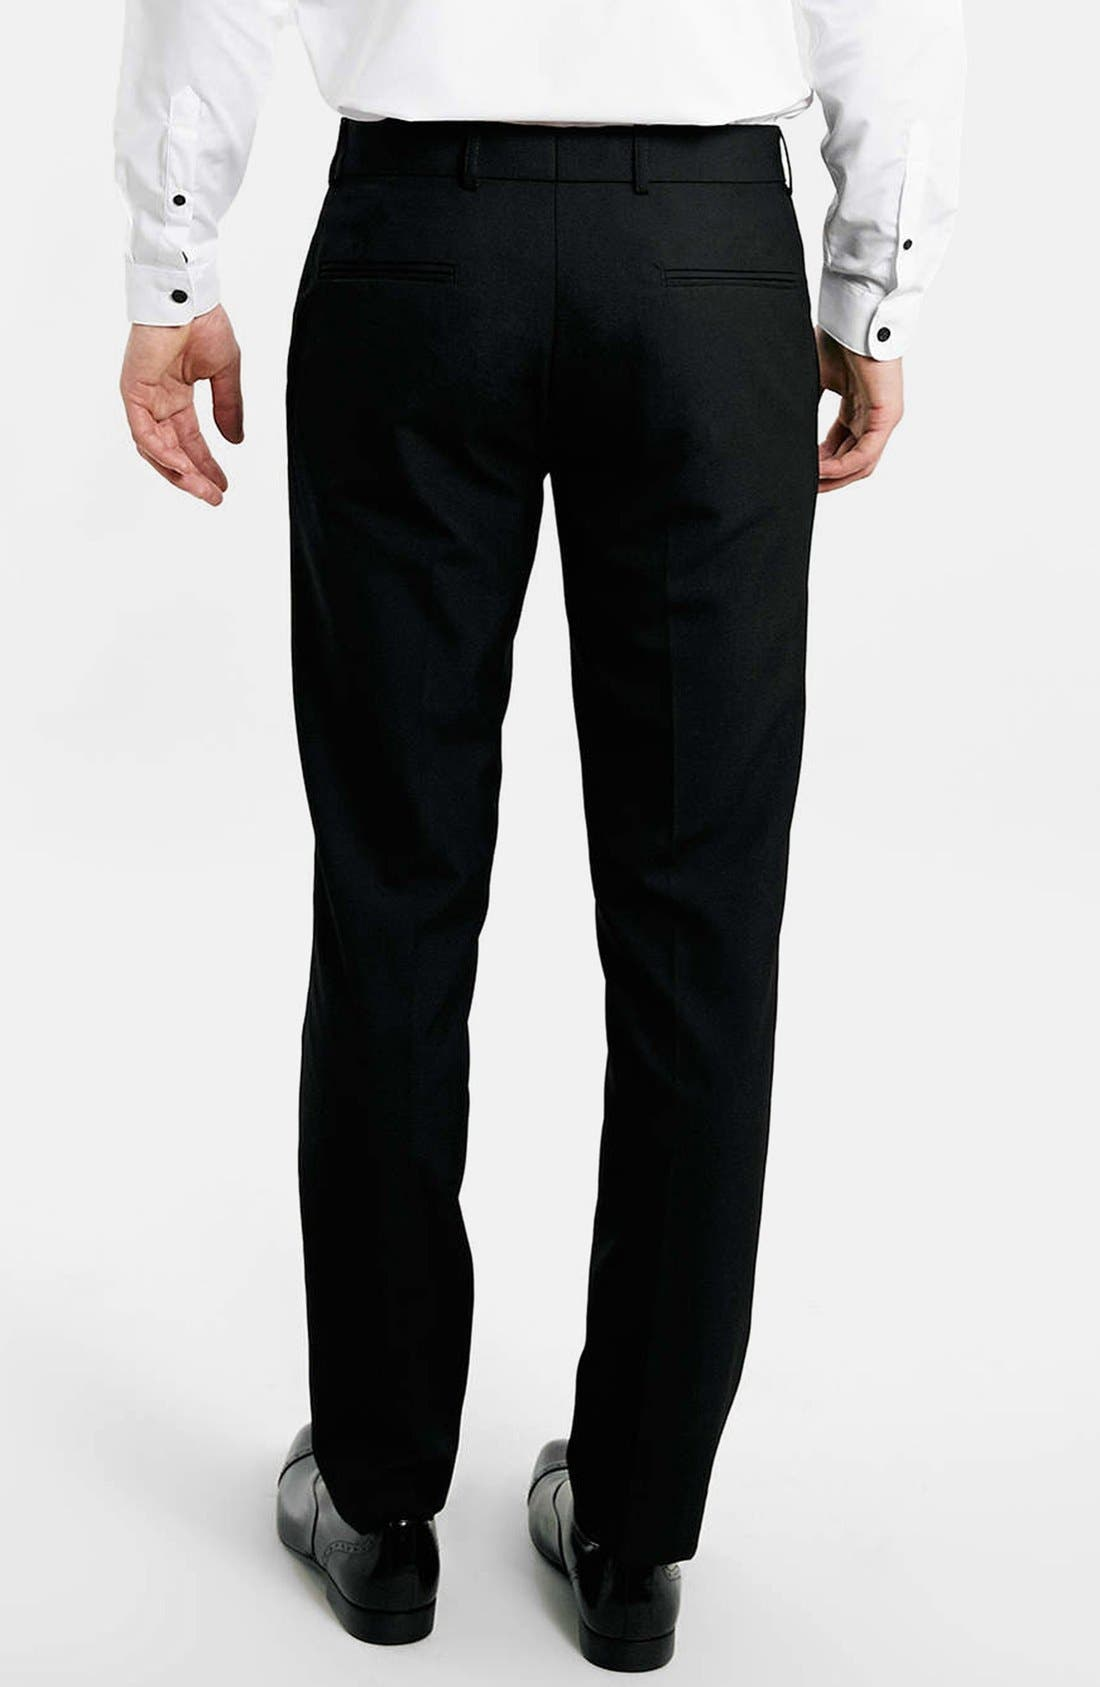 Black Skinny Fit Trousers,                             Alternate thumbnail 3, color,                             001